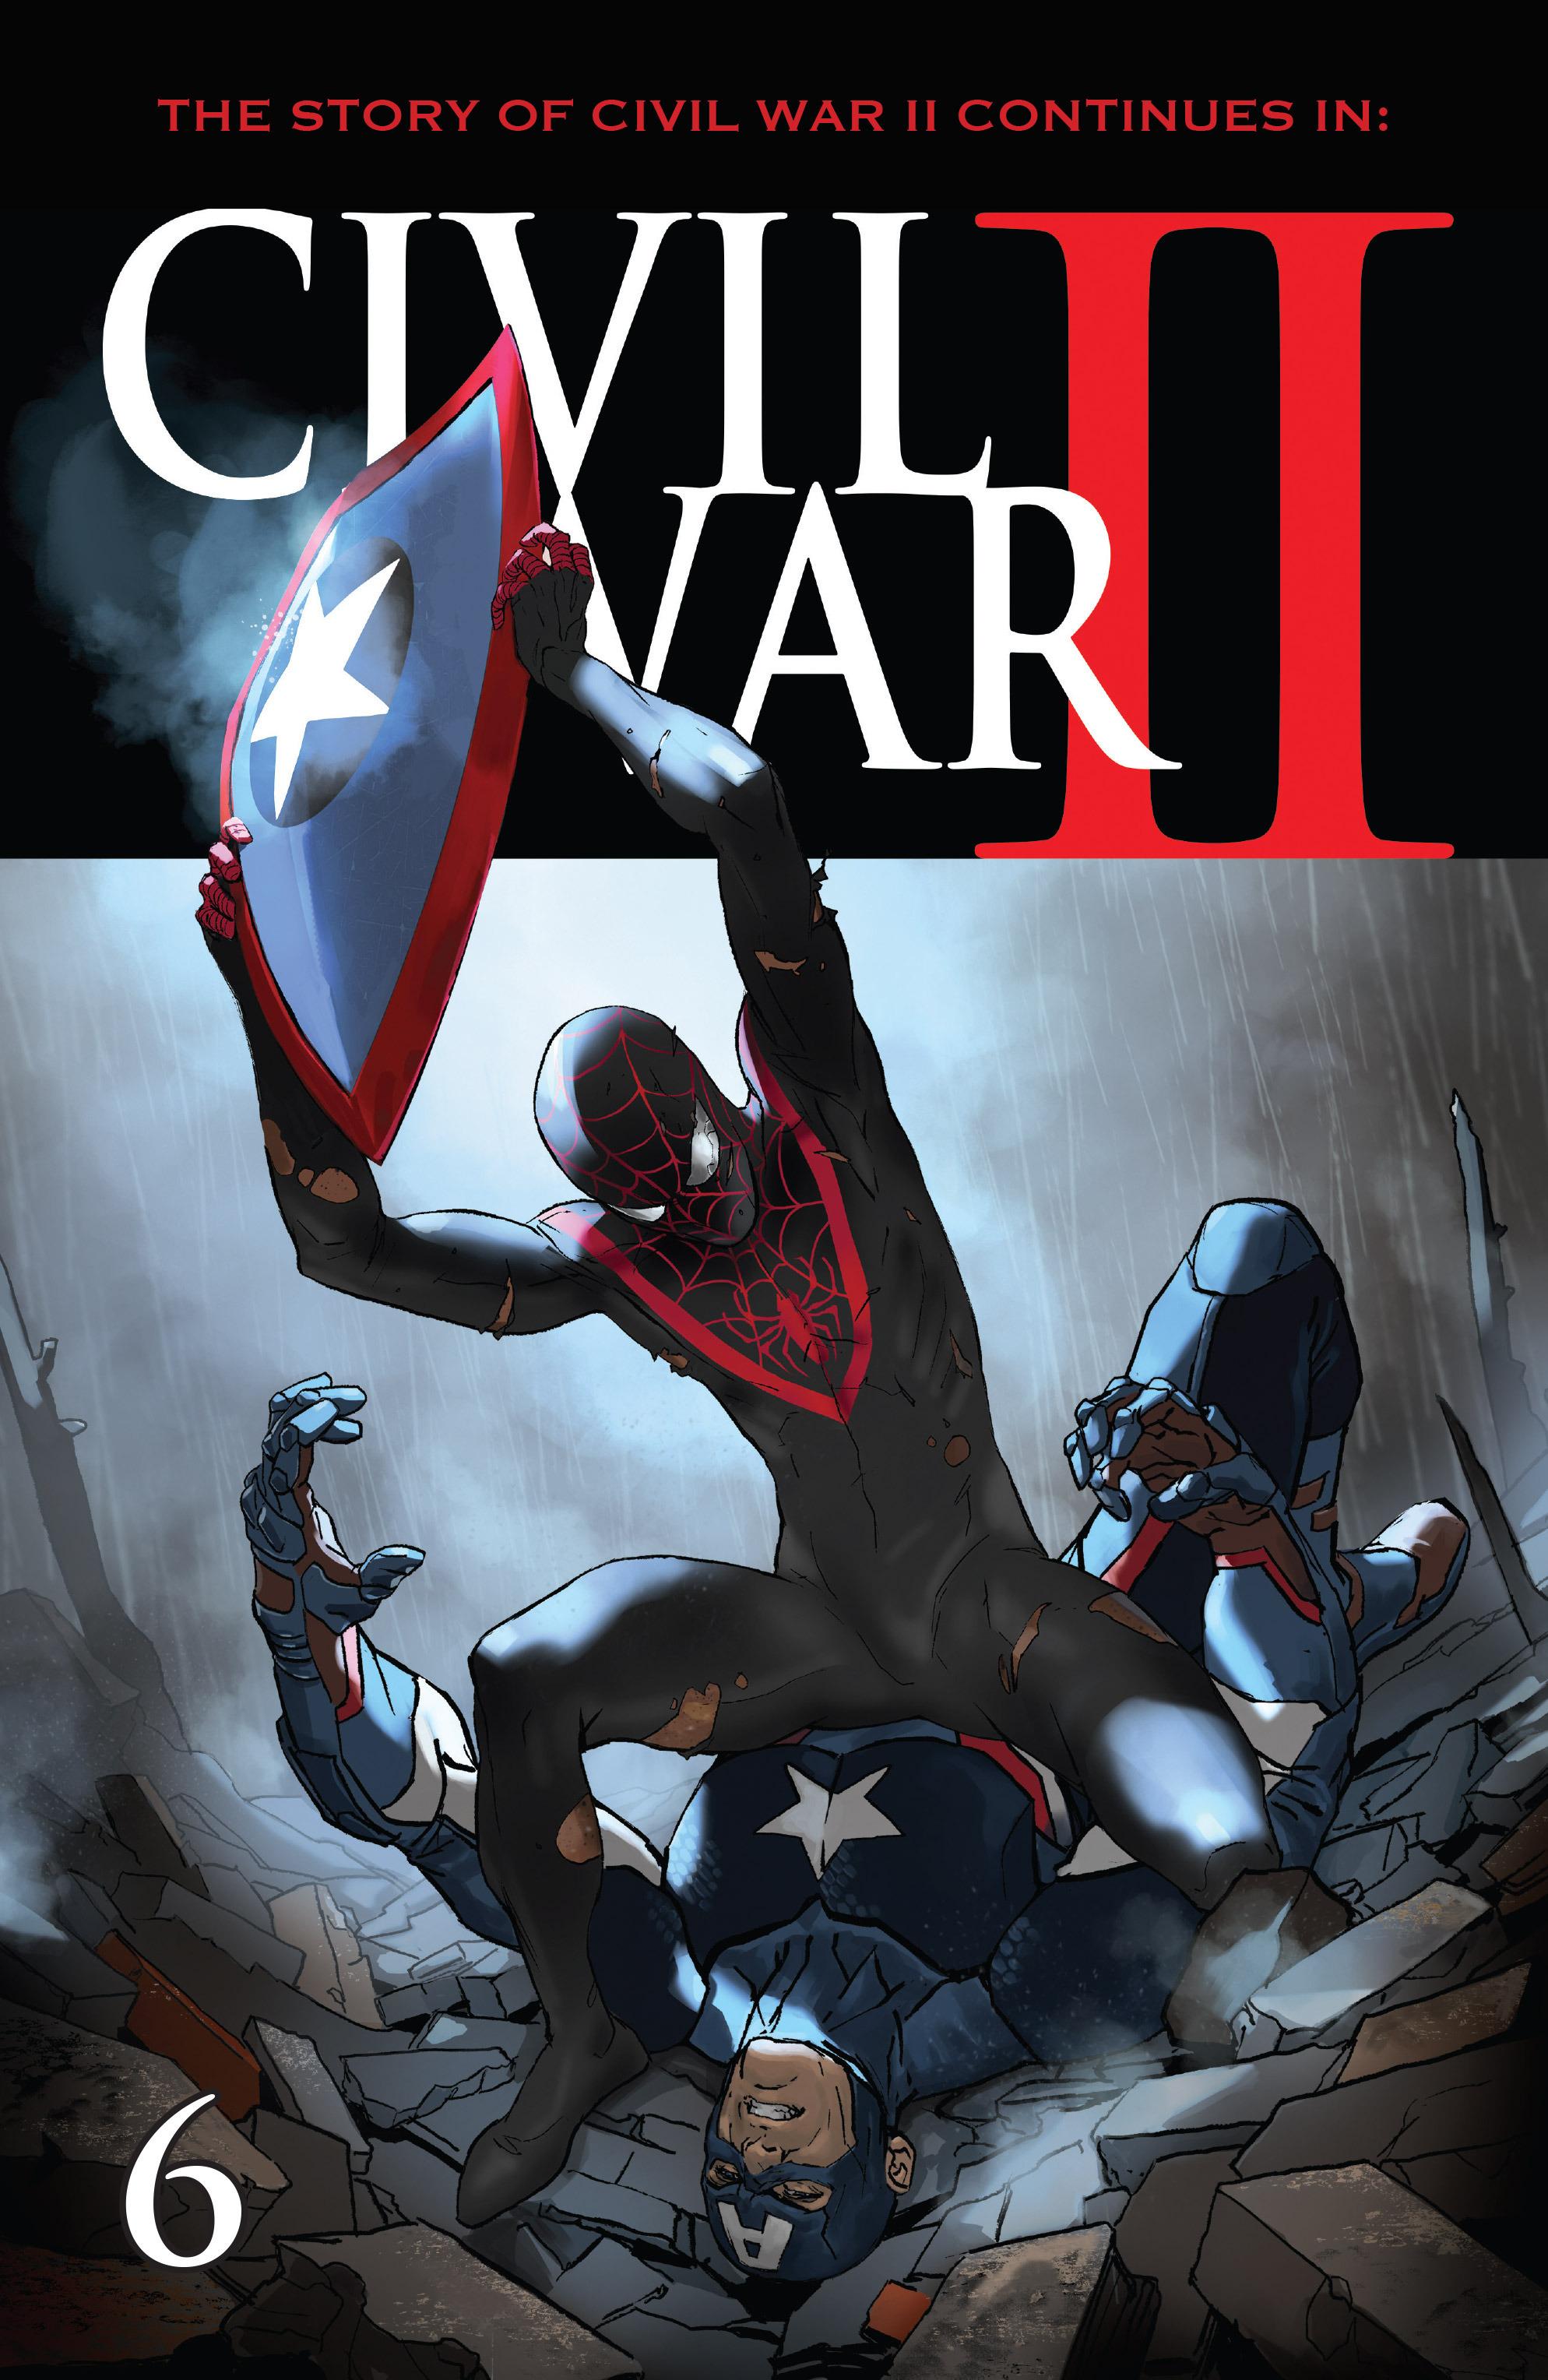 Read online Civil War II: Choosing Sides comic -  Issue #6 - 24